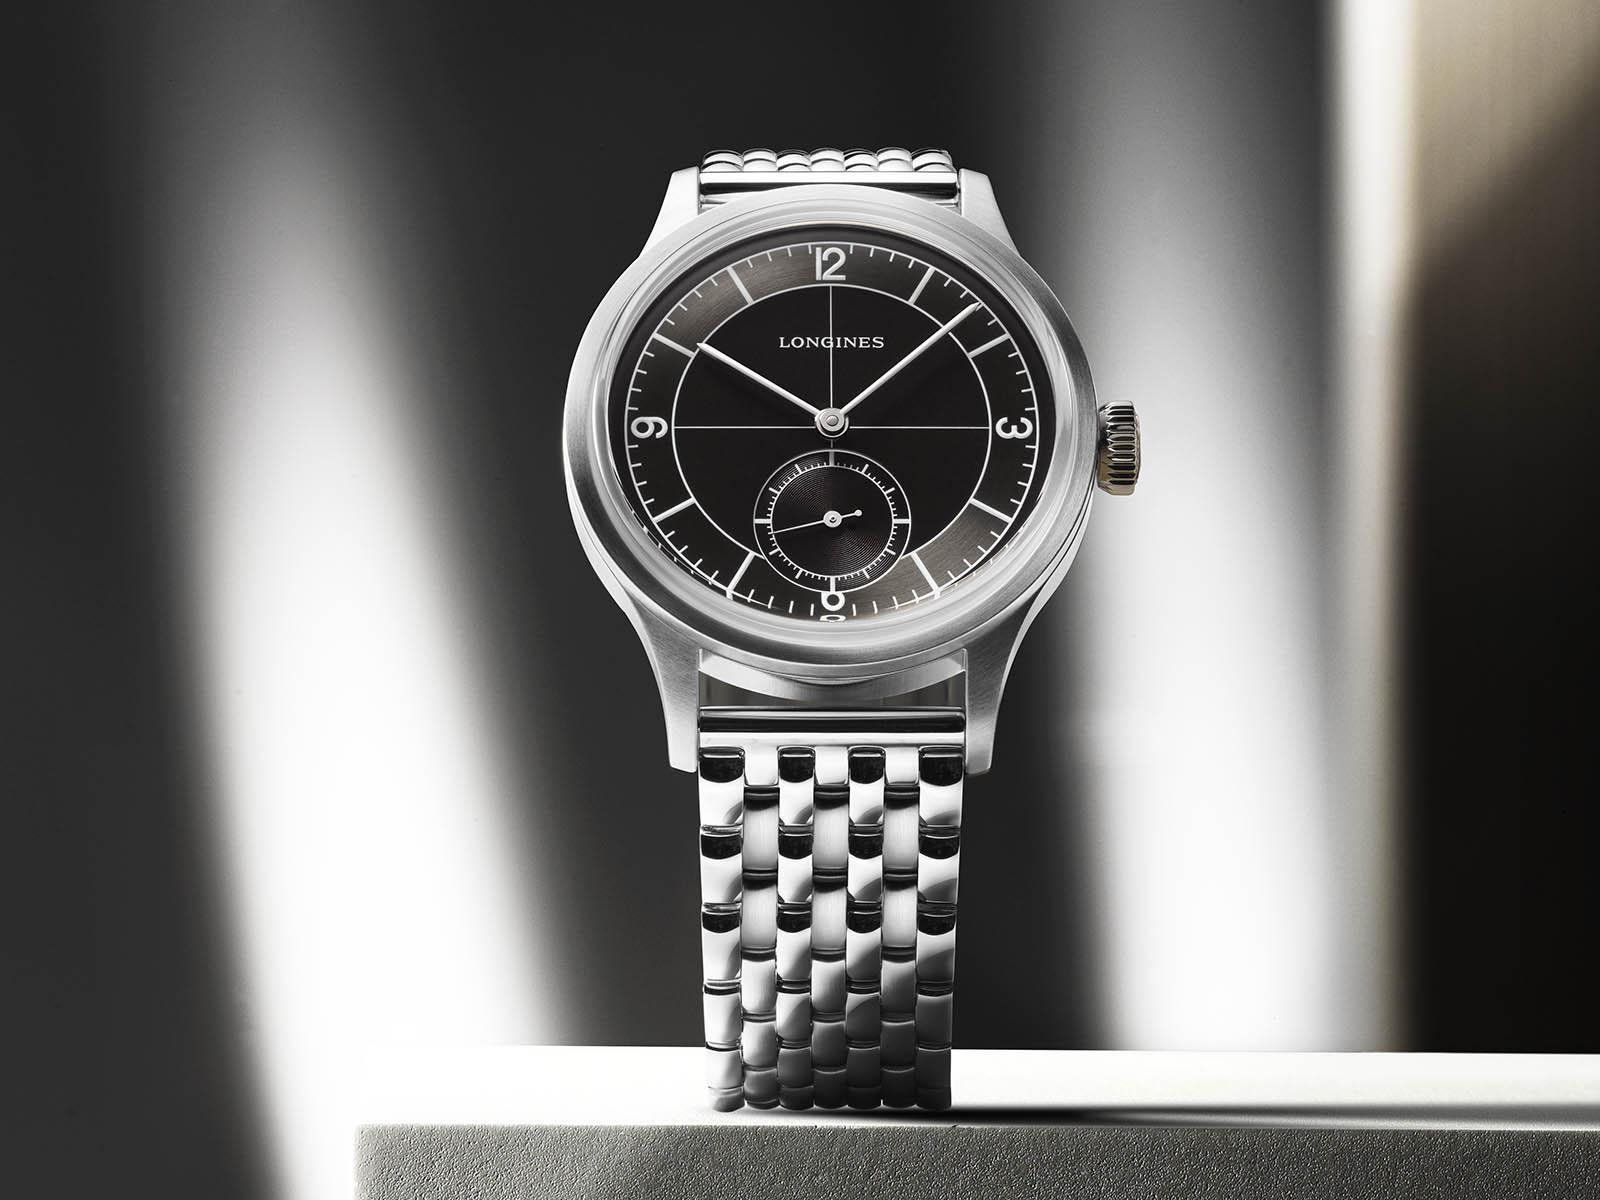 l2-828-4-53-6-longines-heritage-classic-black-dial-1.jpg